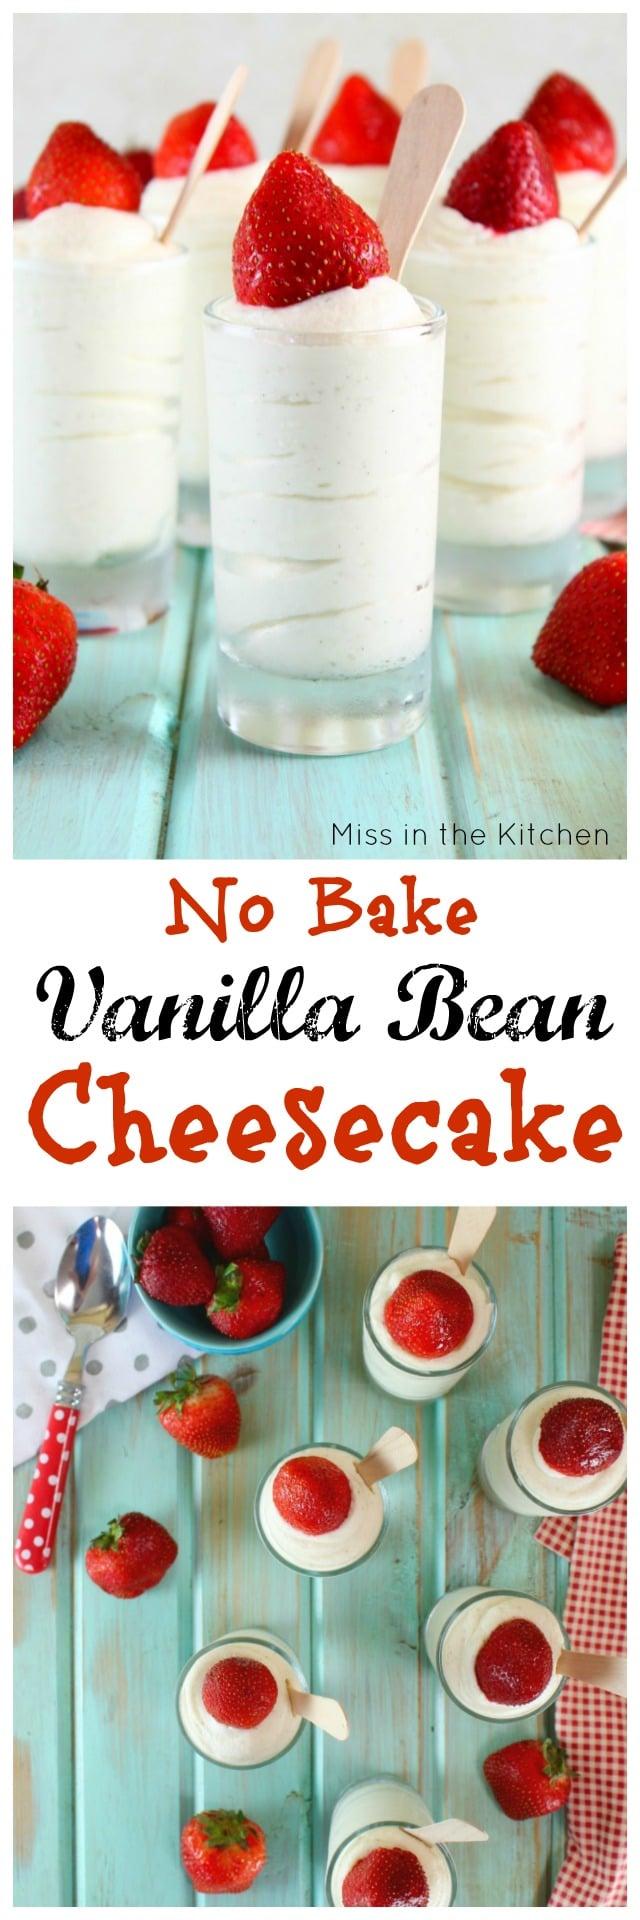 No Bake Vanilla Bean Cheesecake Recipe ~ Easy Dessert for entertaining ~ MissintheKitchen.com